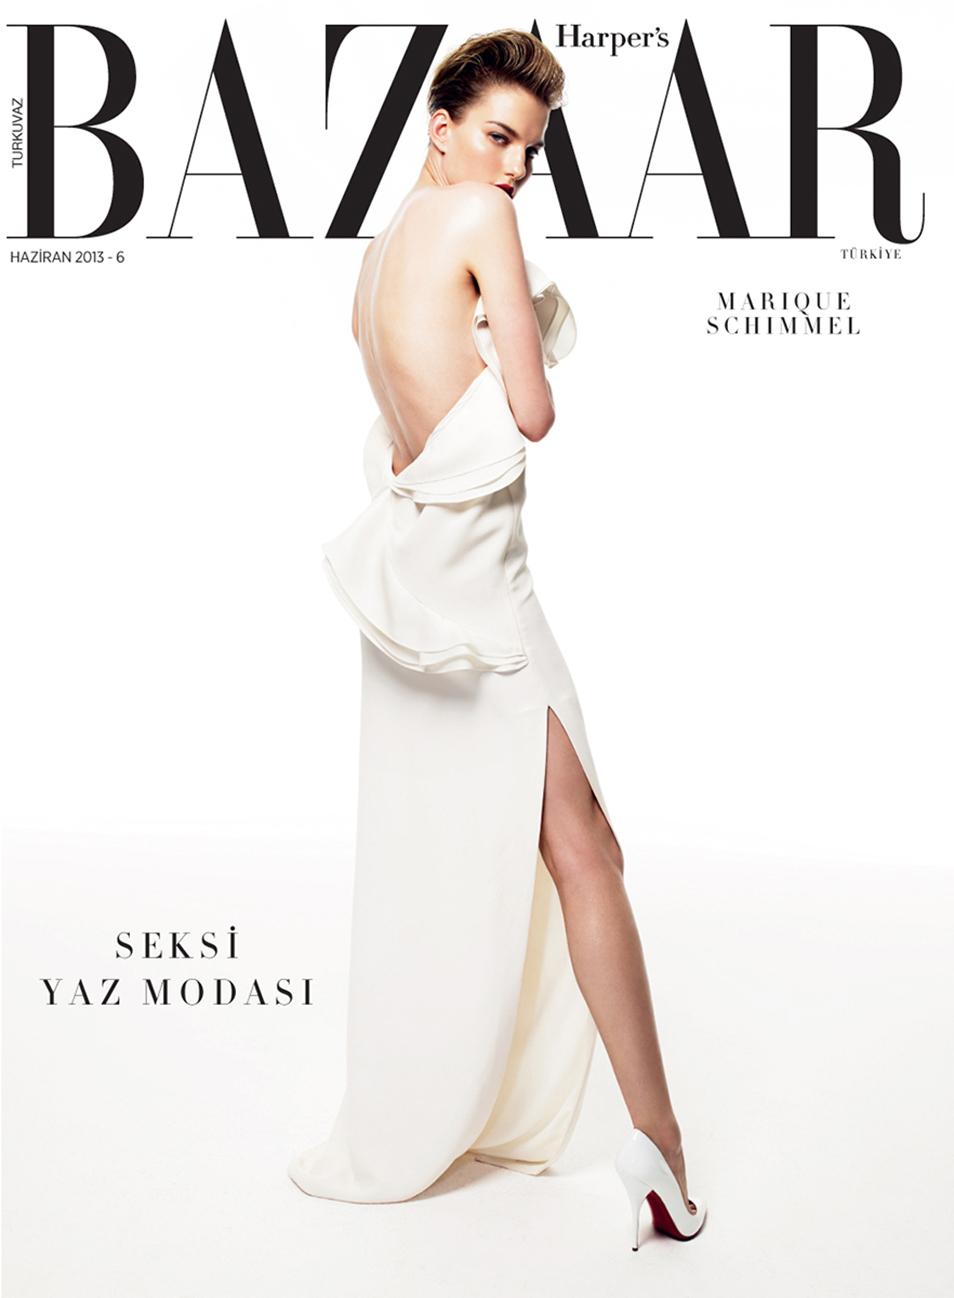 Marque Schimmel - Harpers Bazaar Turkey